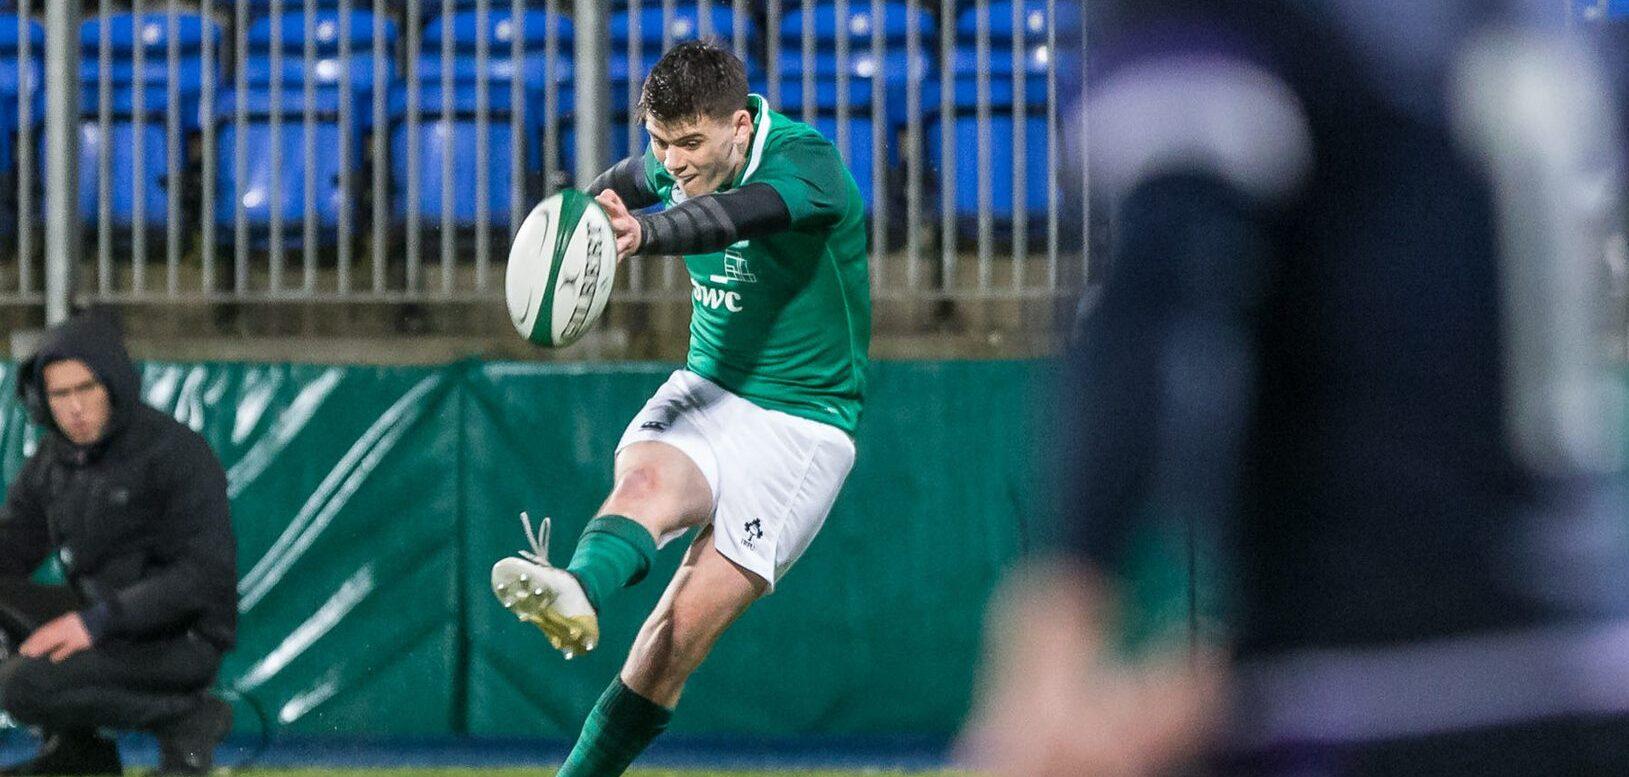 U20 Six Nations: Teams up for Ireland v Scotland